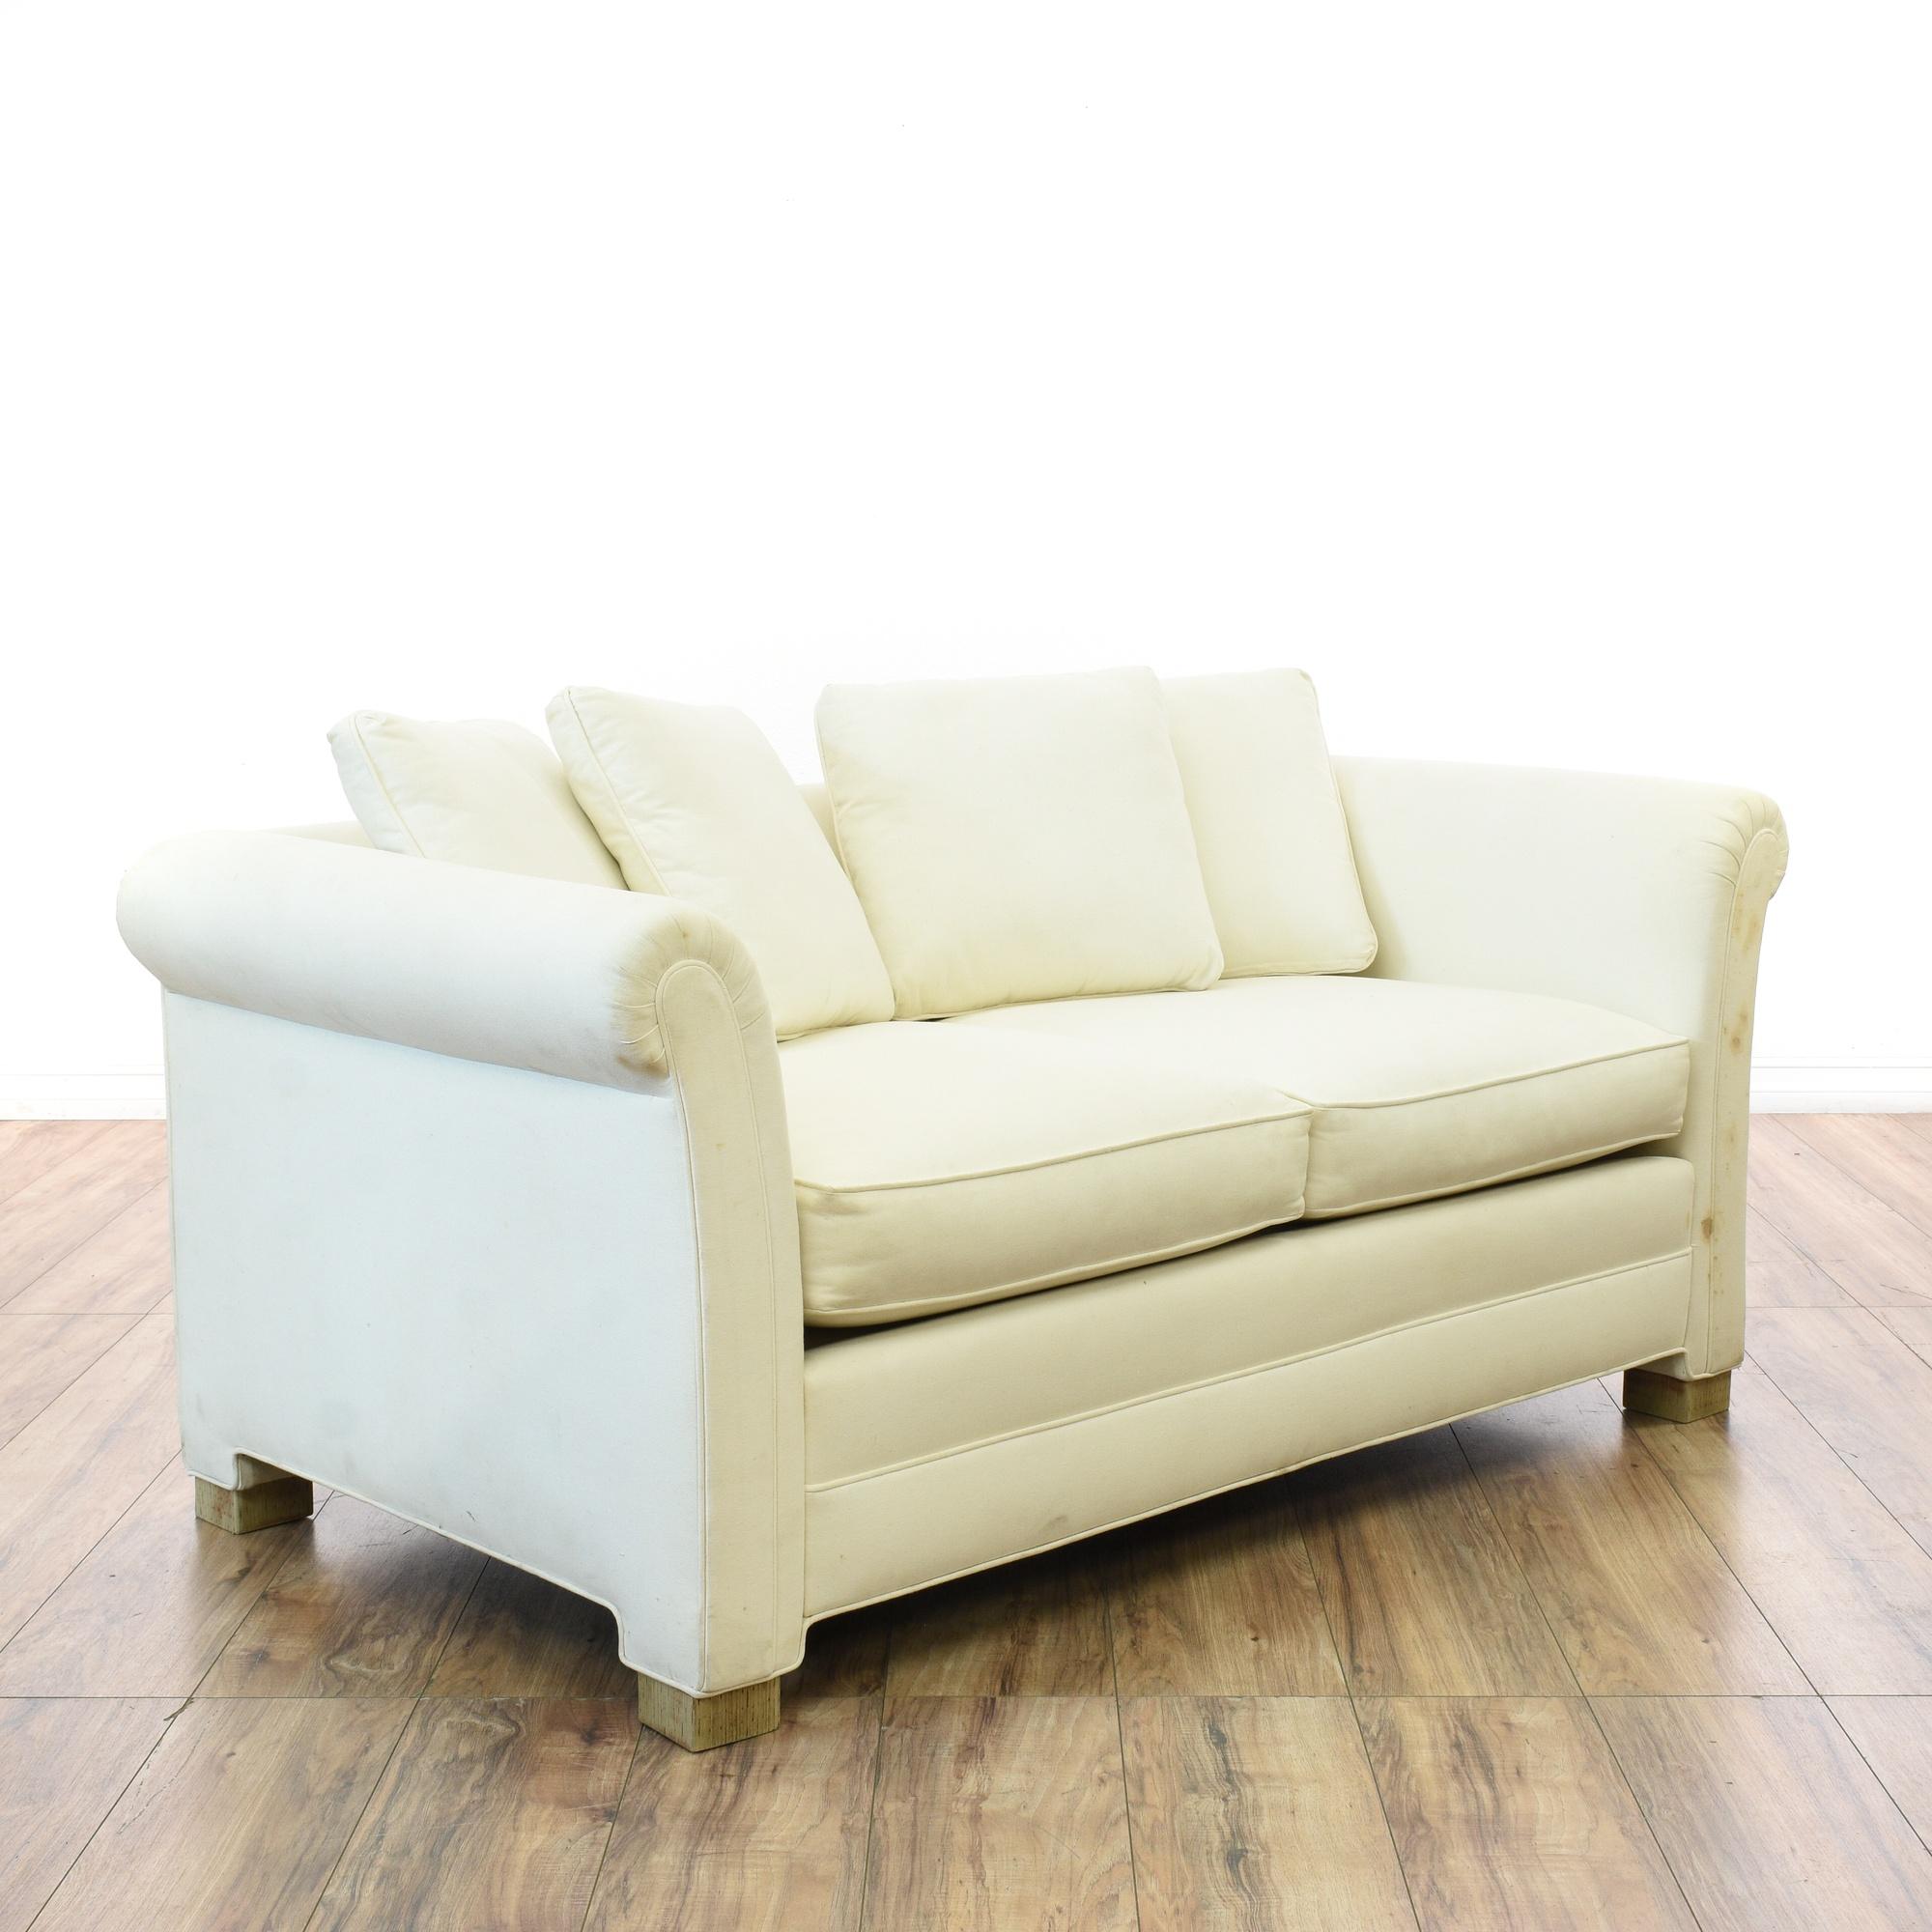 Cottage Chic White Loveseat Sofa